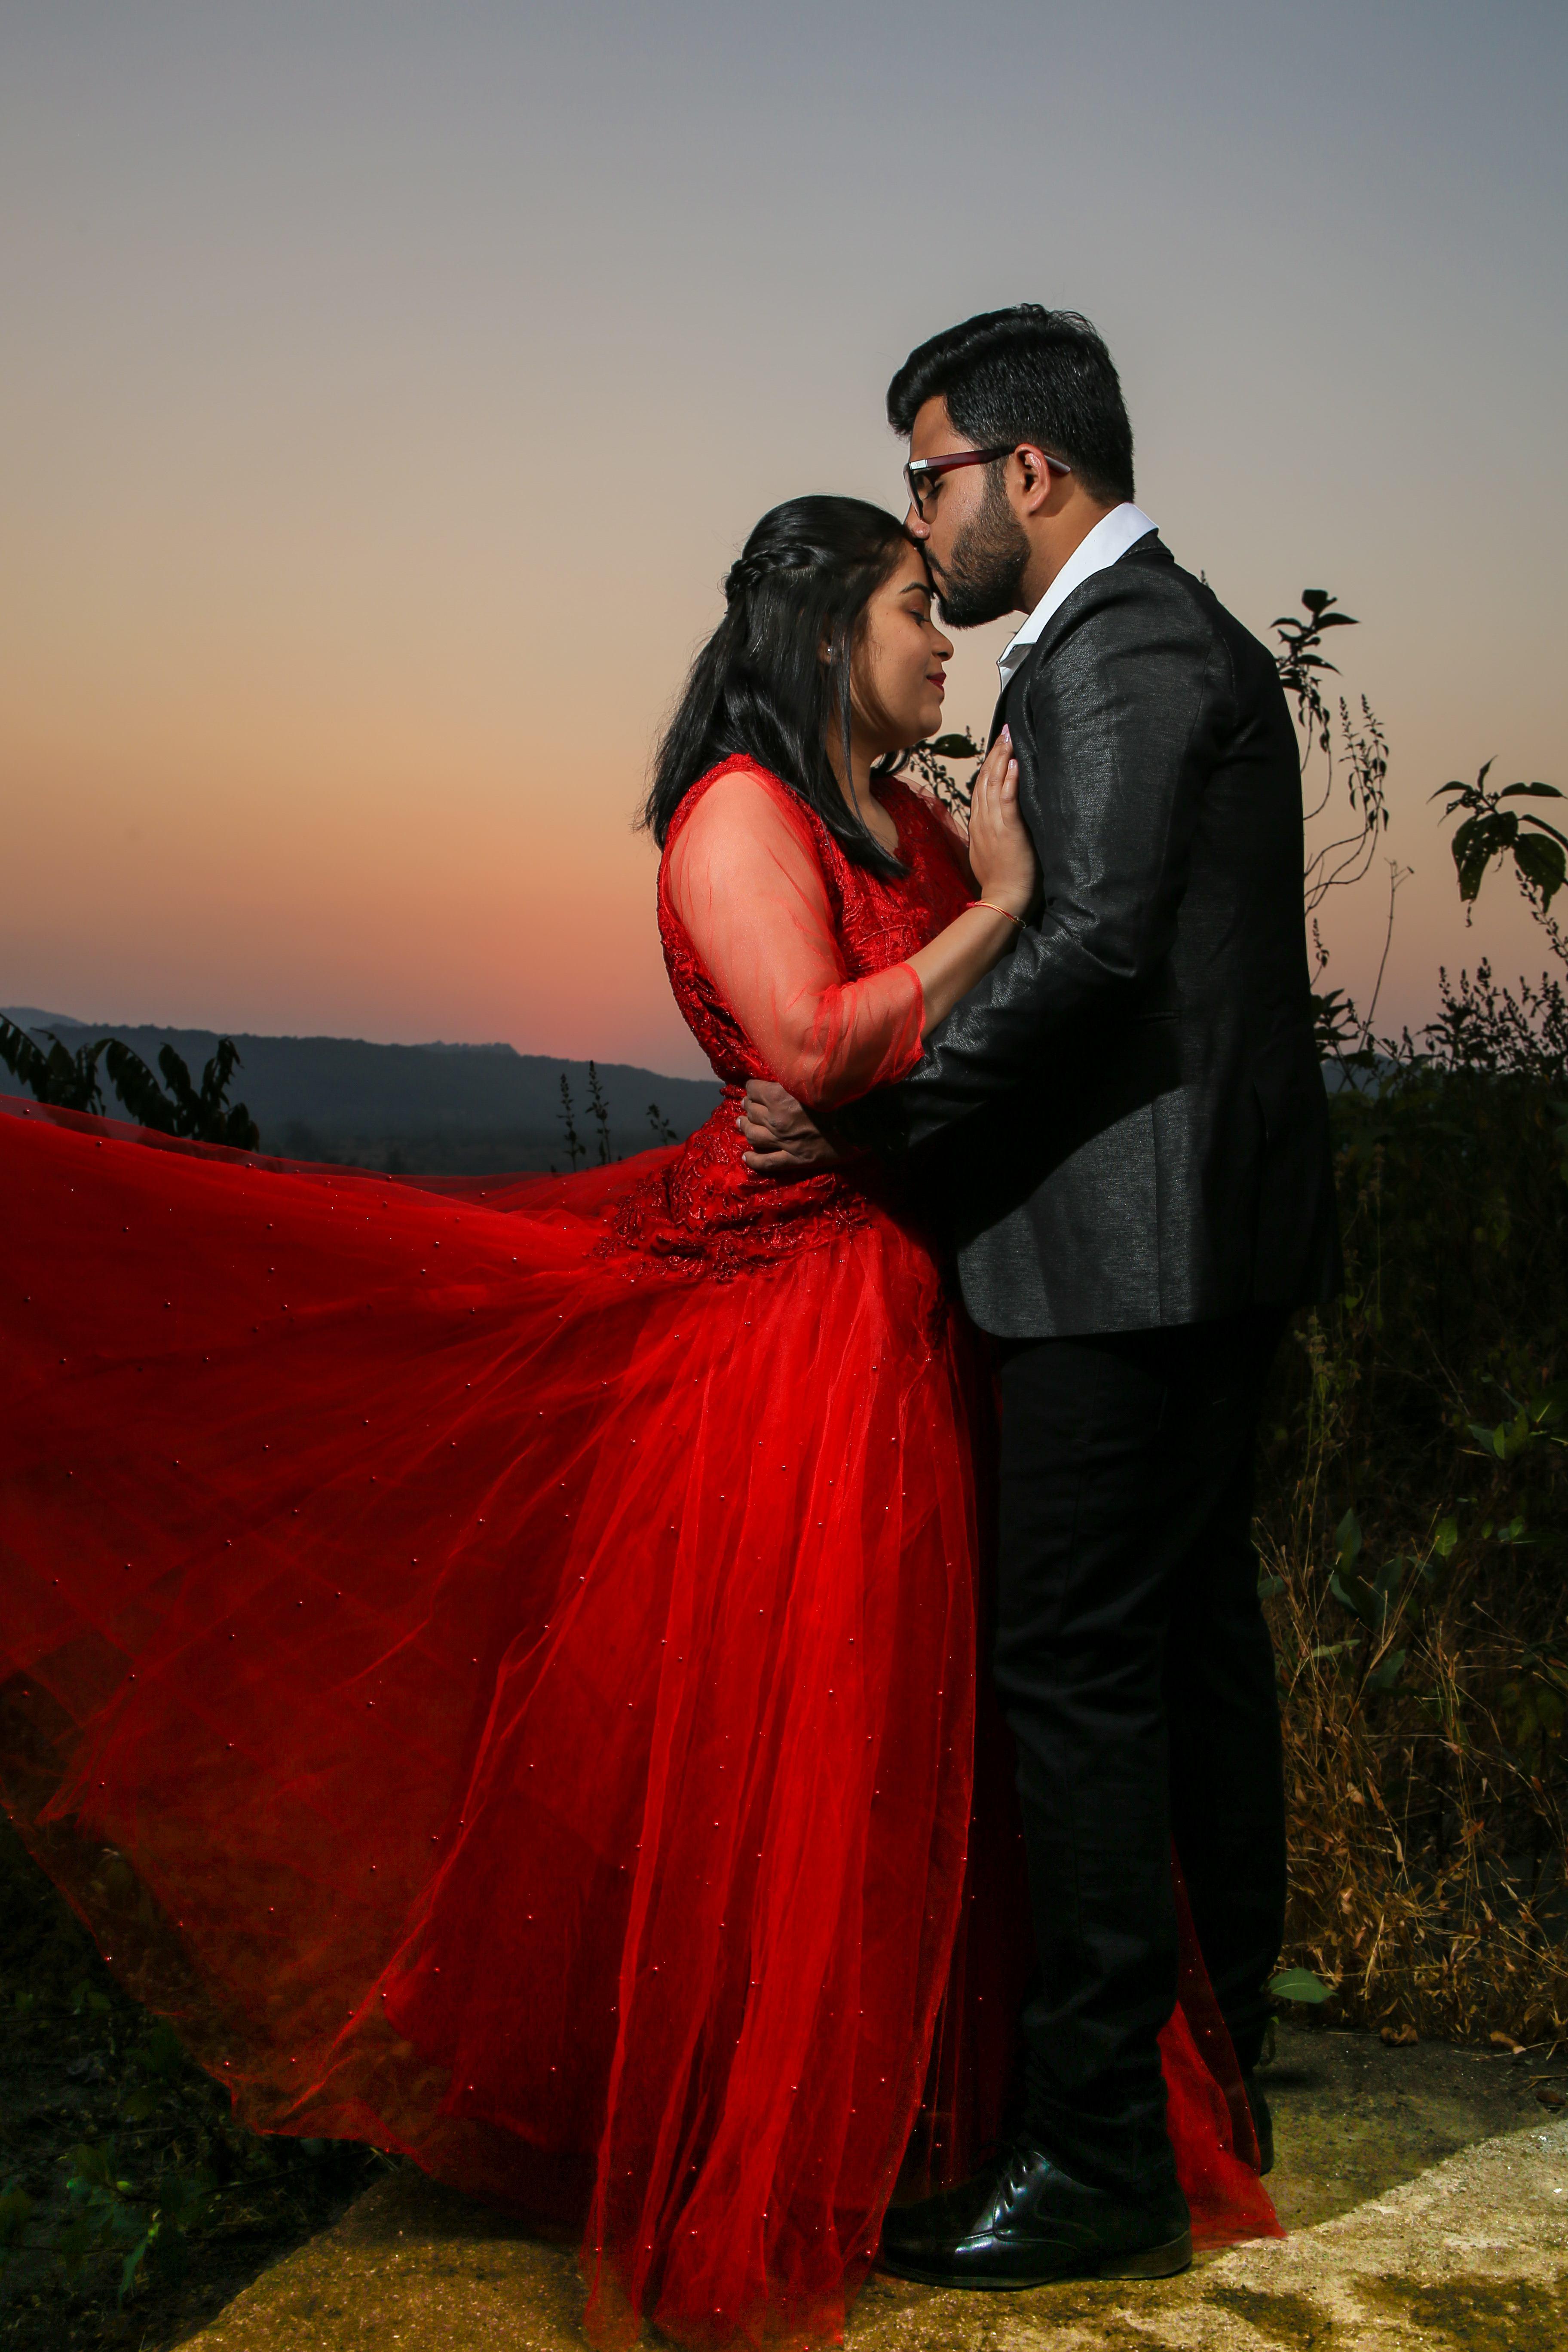 pre-wedding-shoot@8122040$img-11.jpg